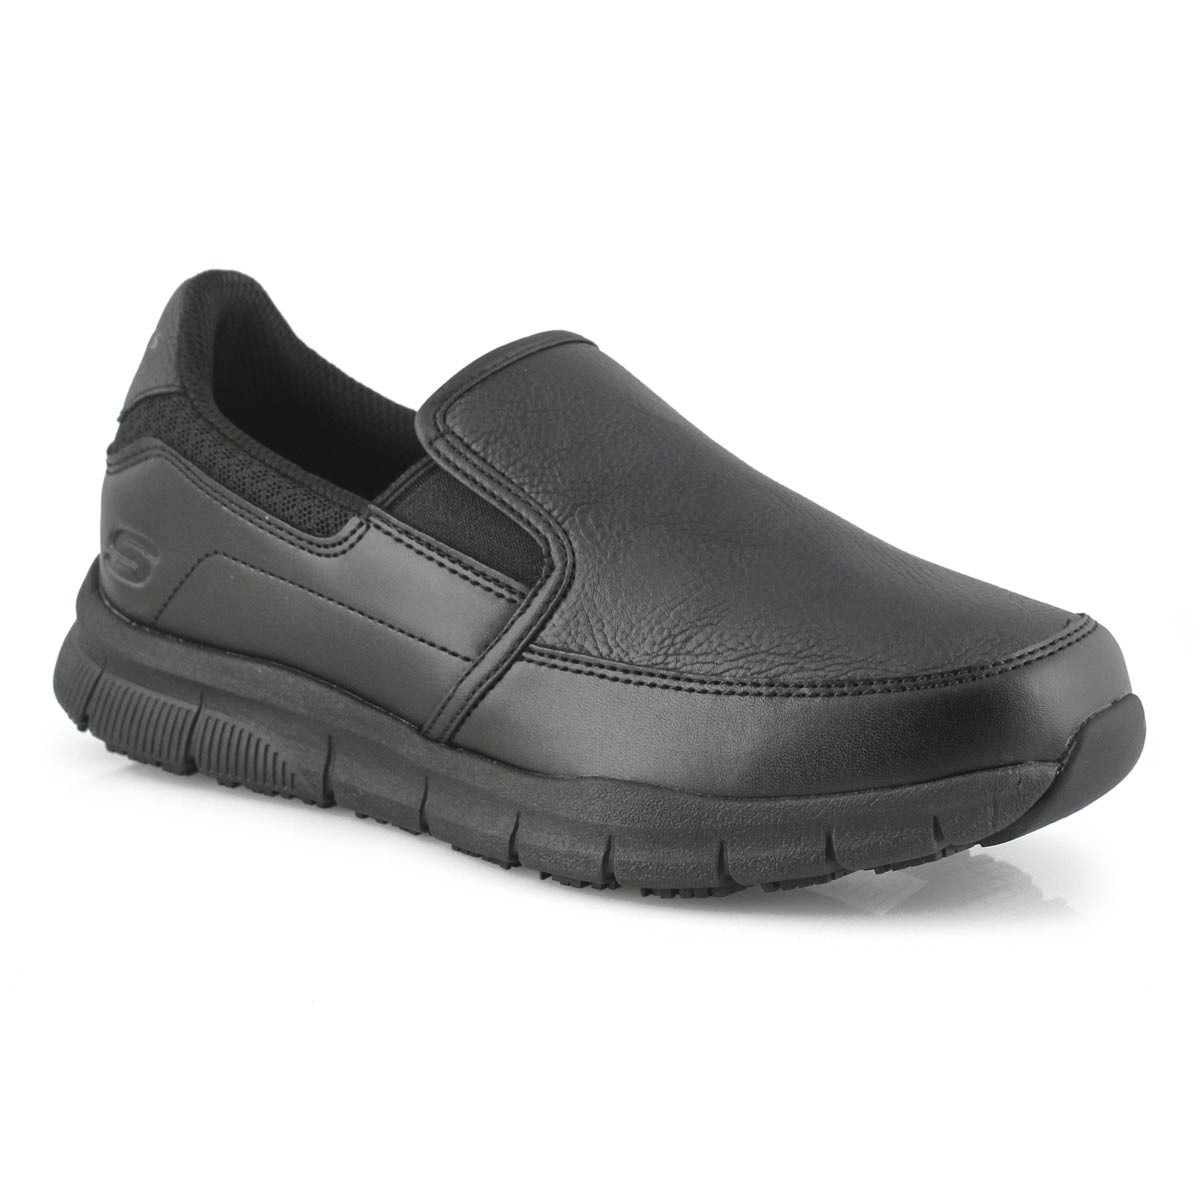 Lds Nampa Annod blk slip resistant shoe